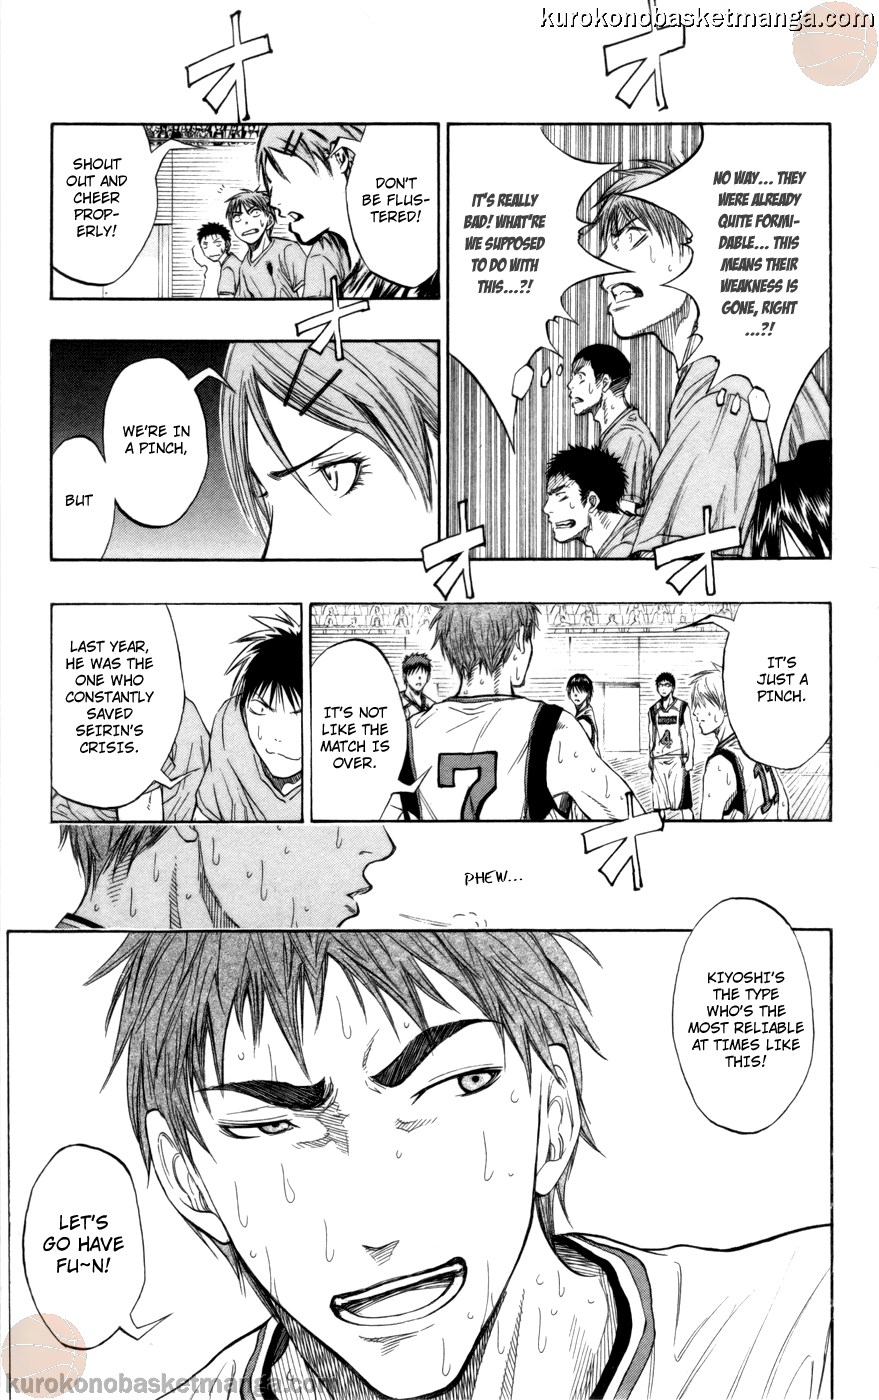 Kuroko no Basket Manga Chapter 87 - Image 23